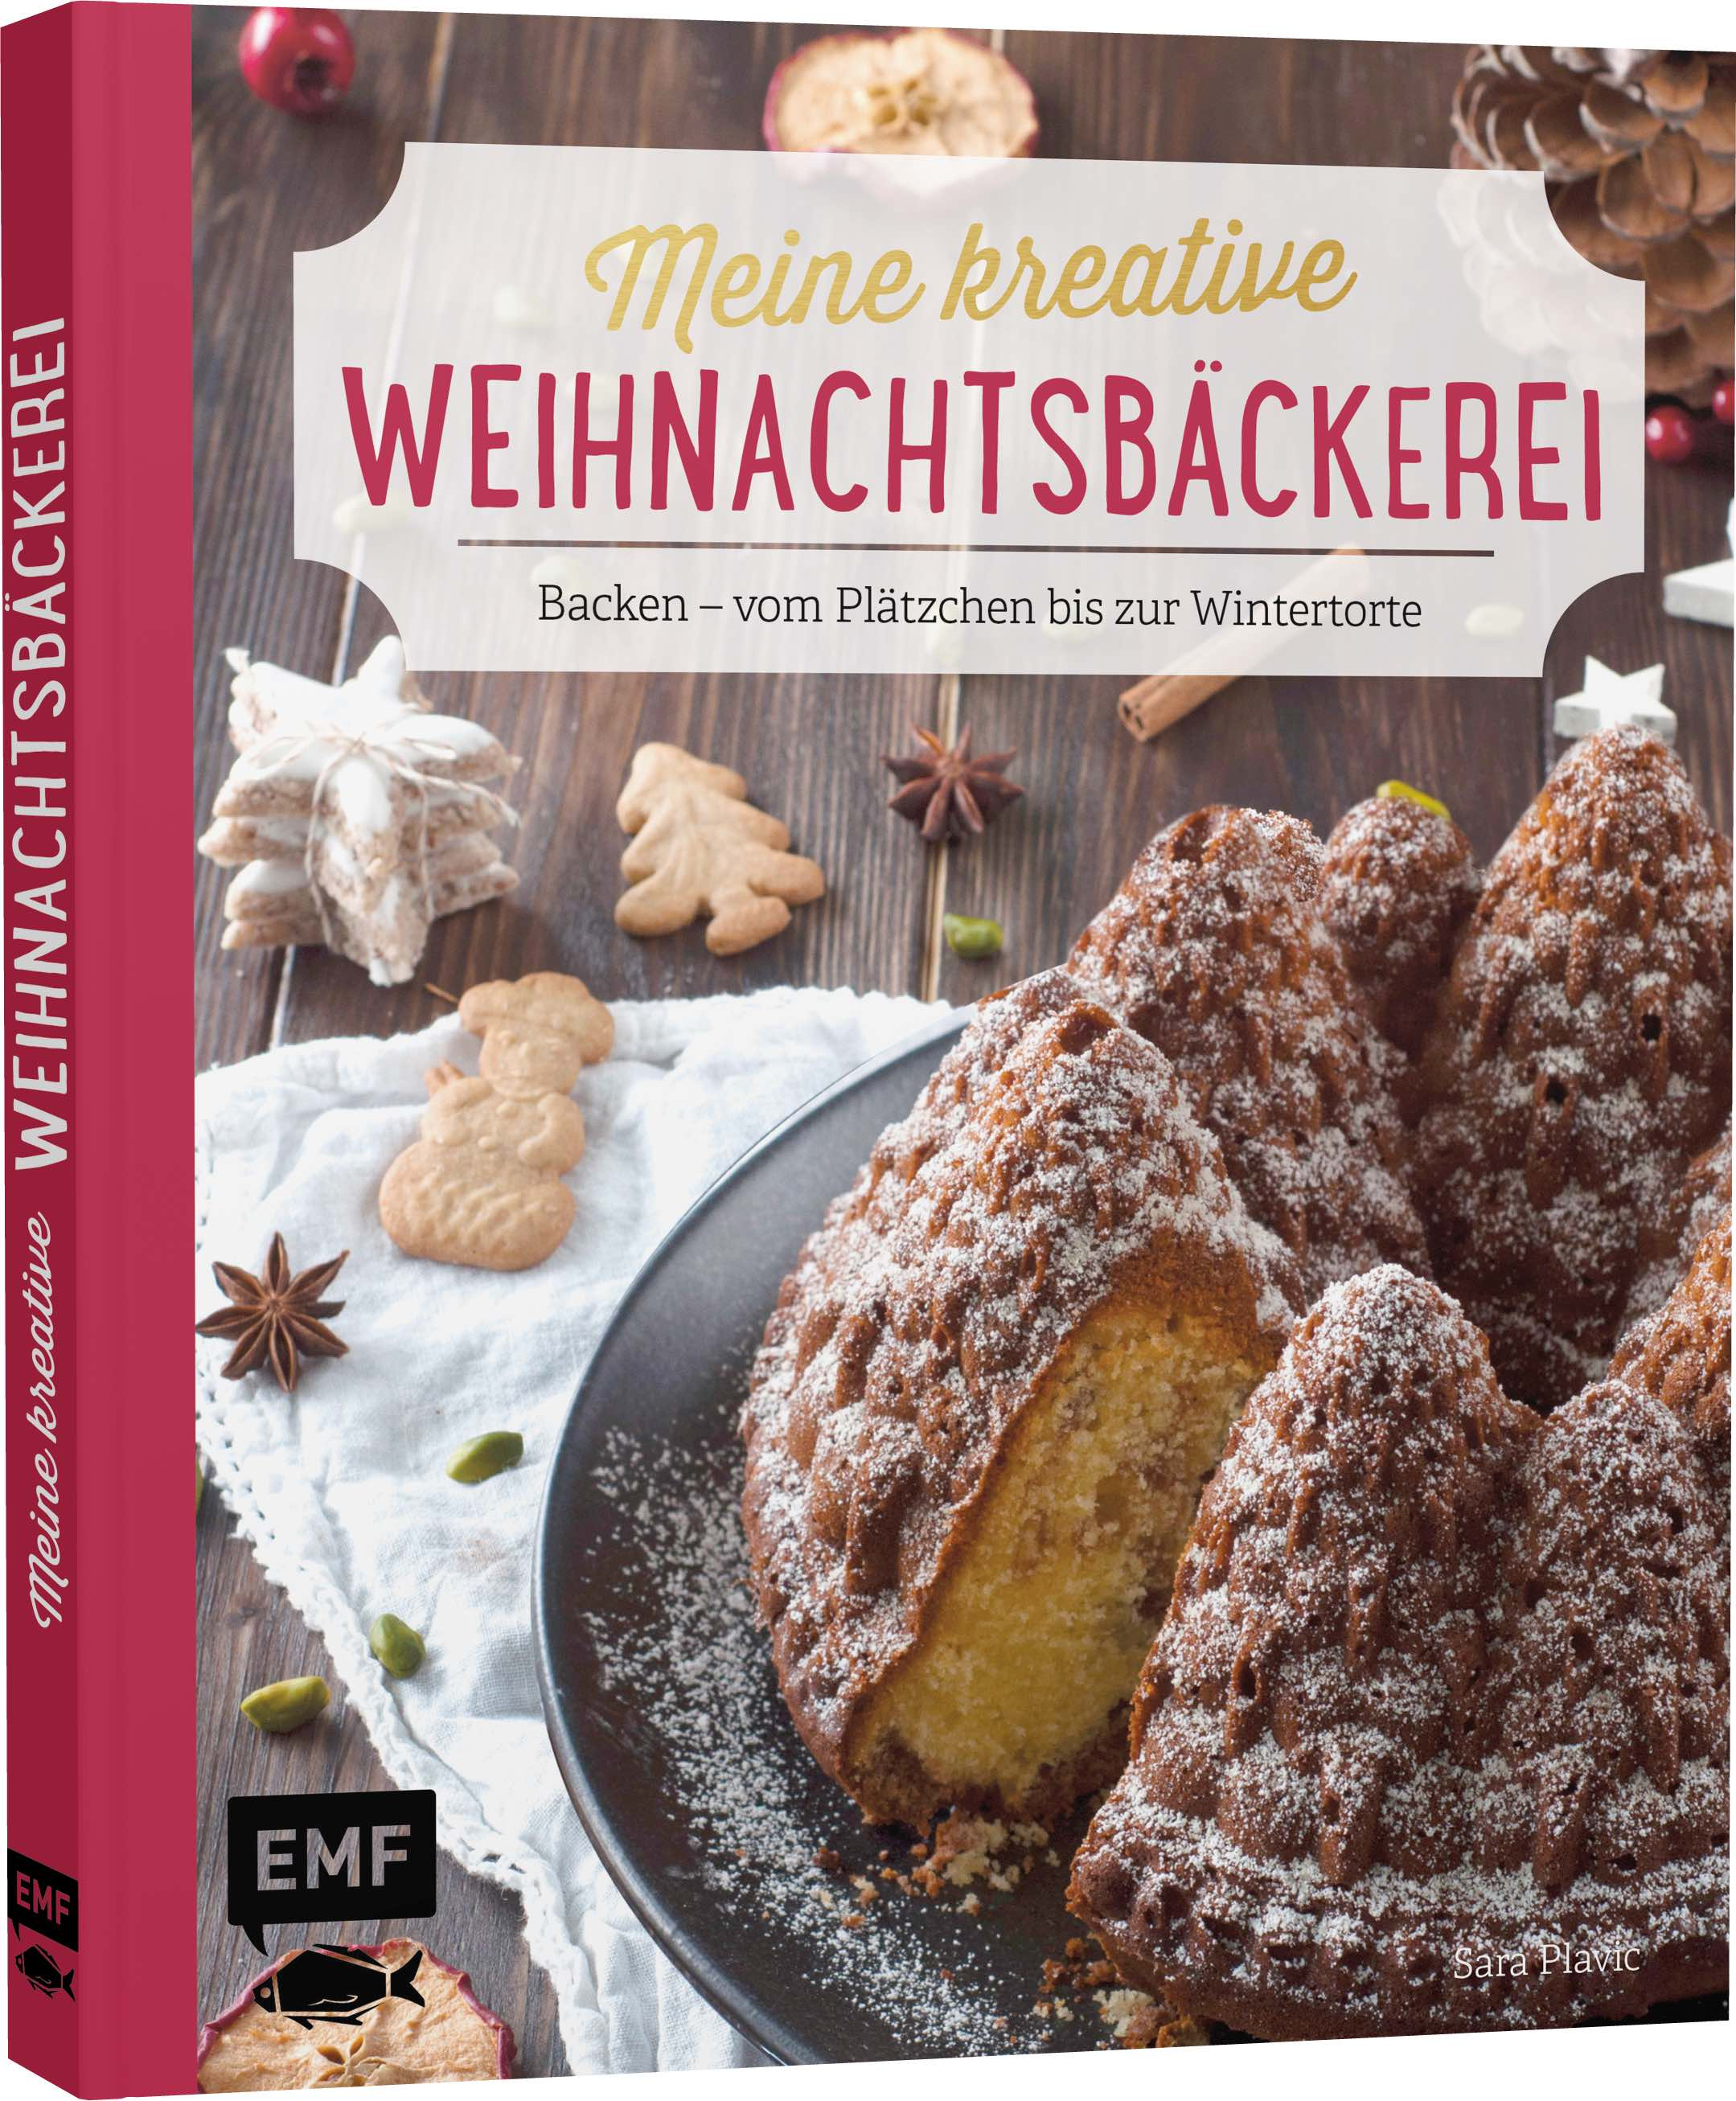 http://www.birdslikecake.de/wp-content/uploads/2016/05/Weihnachtsbäckerei-20x235-96-hard-Kopie.jpg